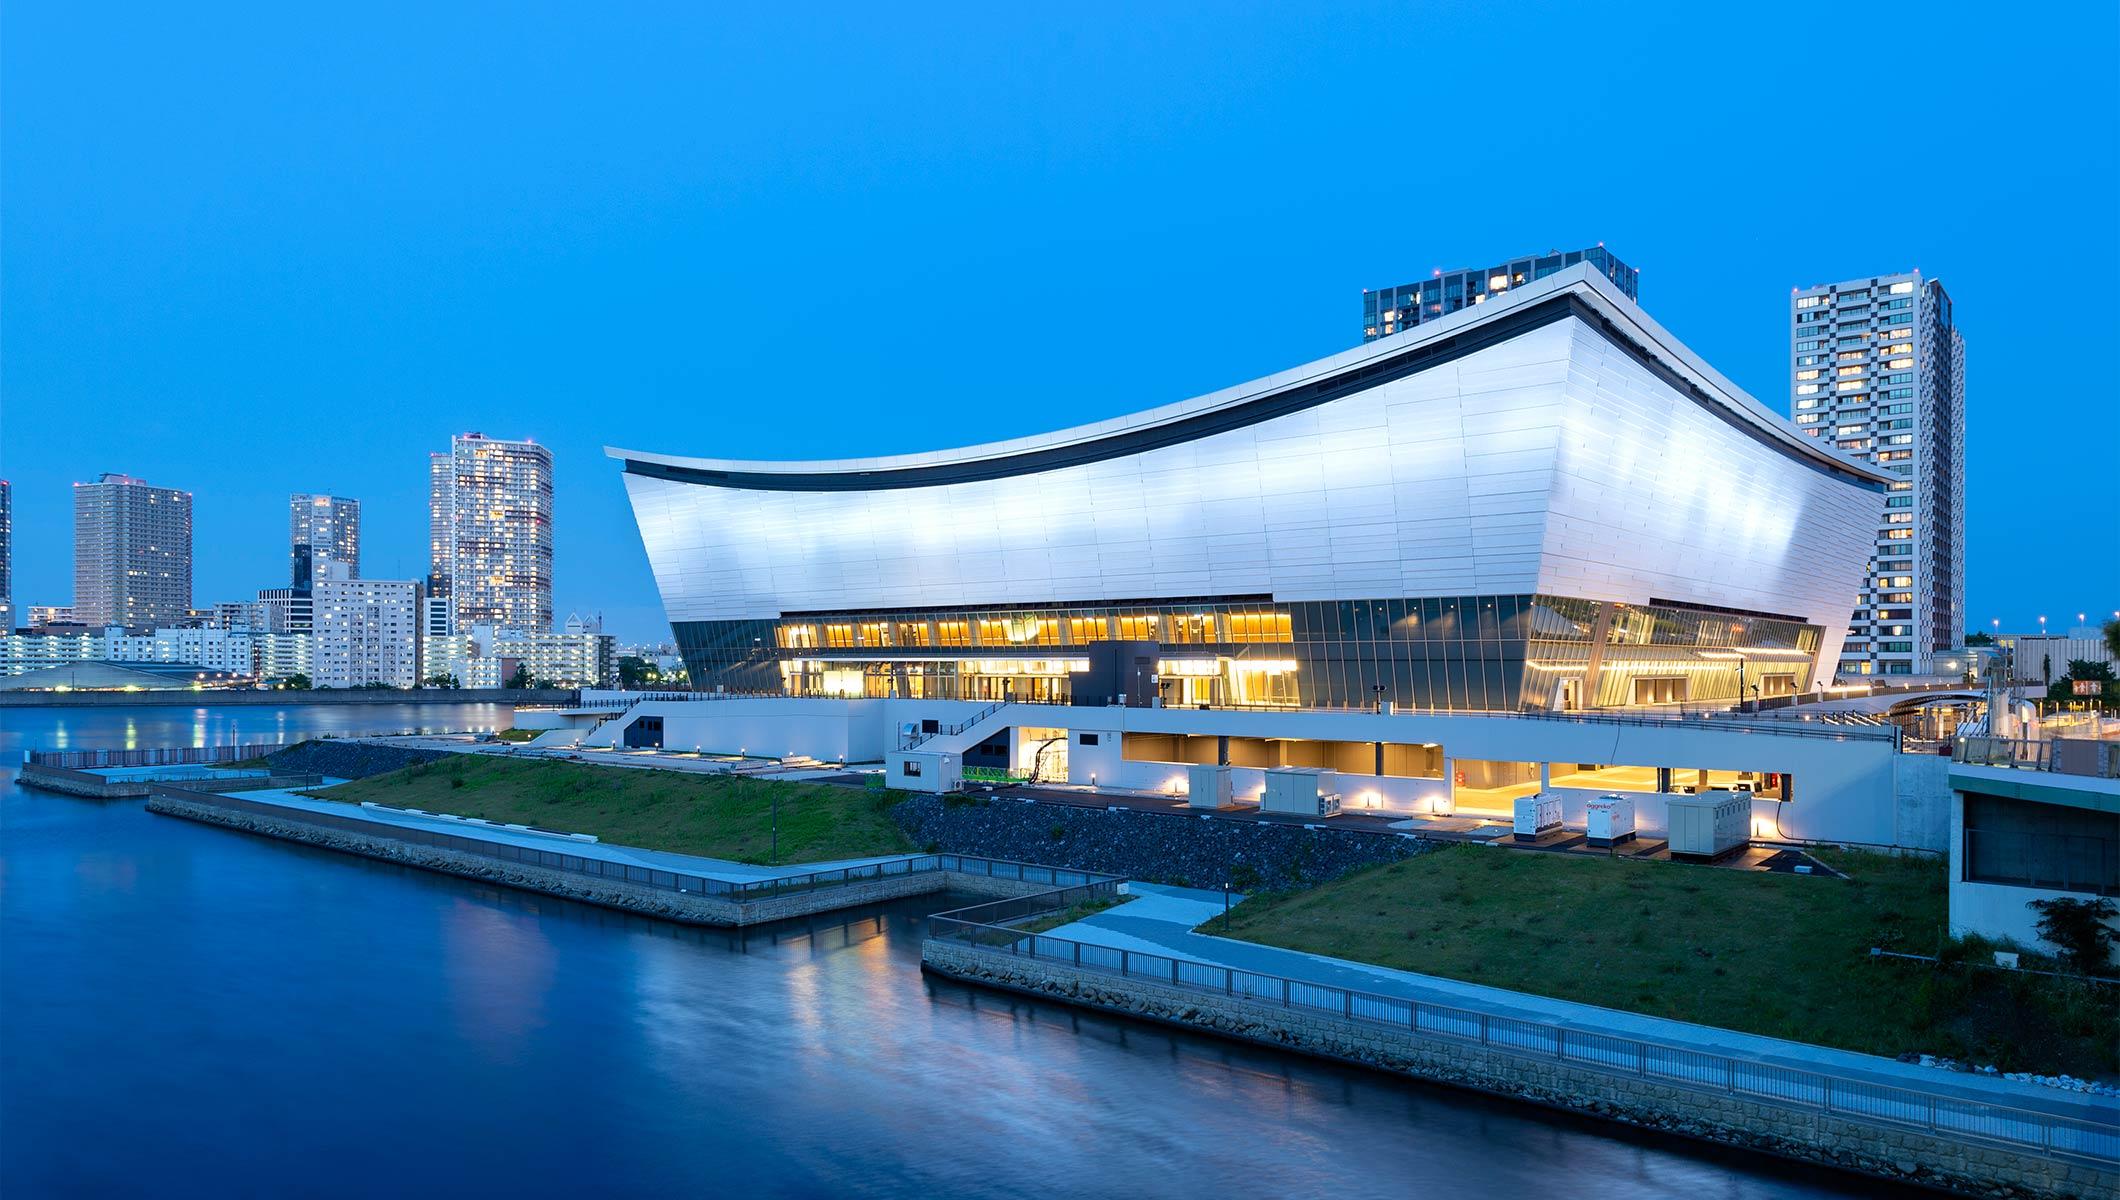 Tokyo 2020 - Ariake Arena